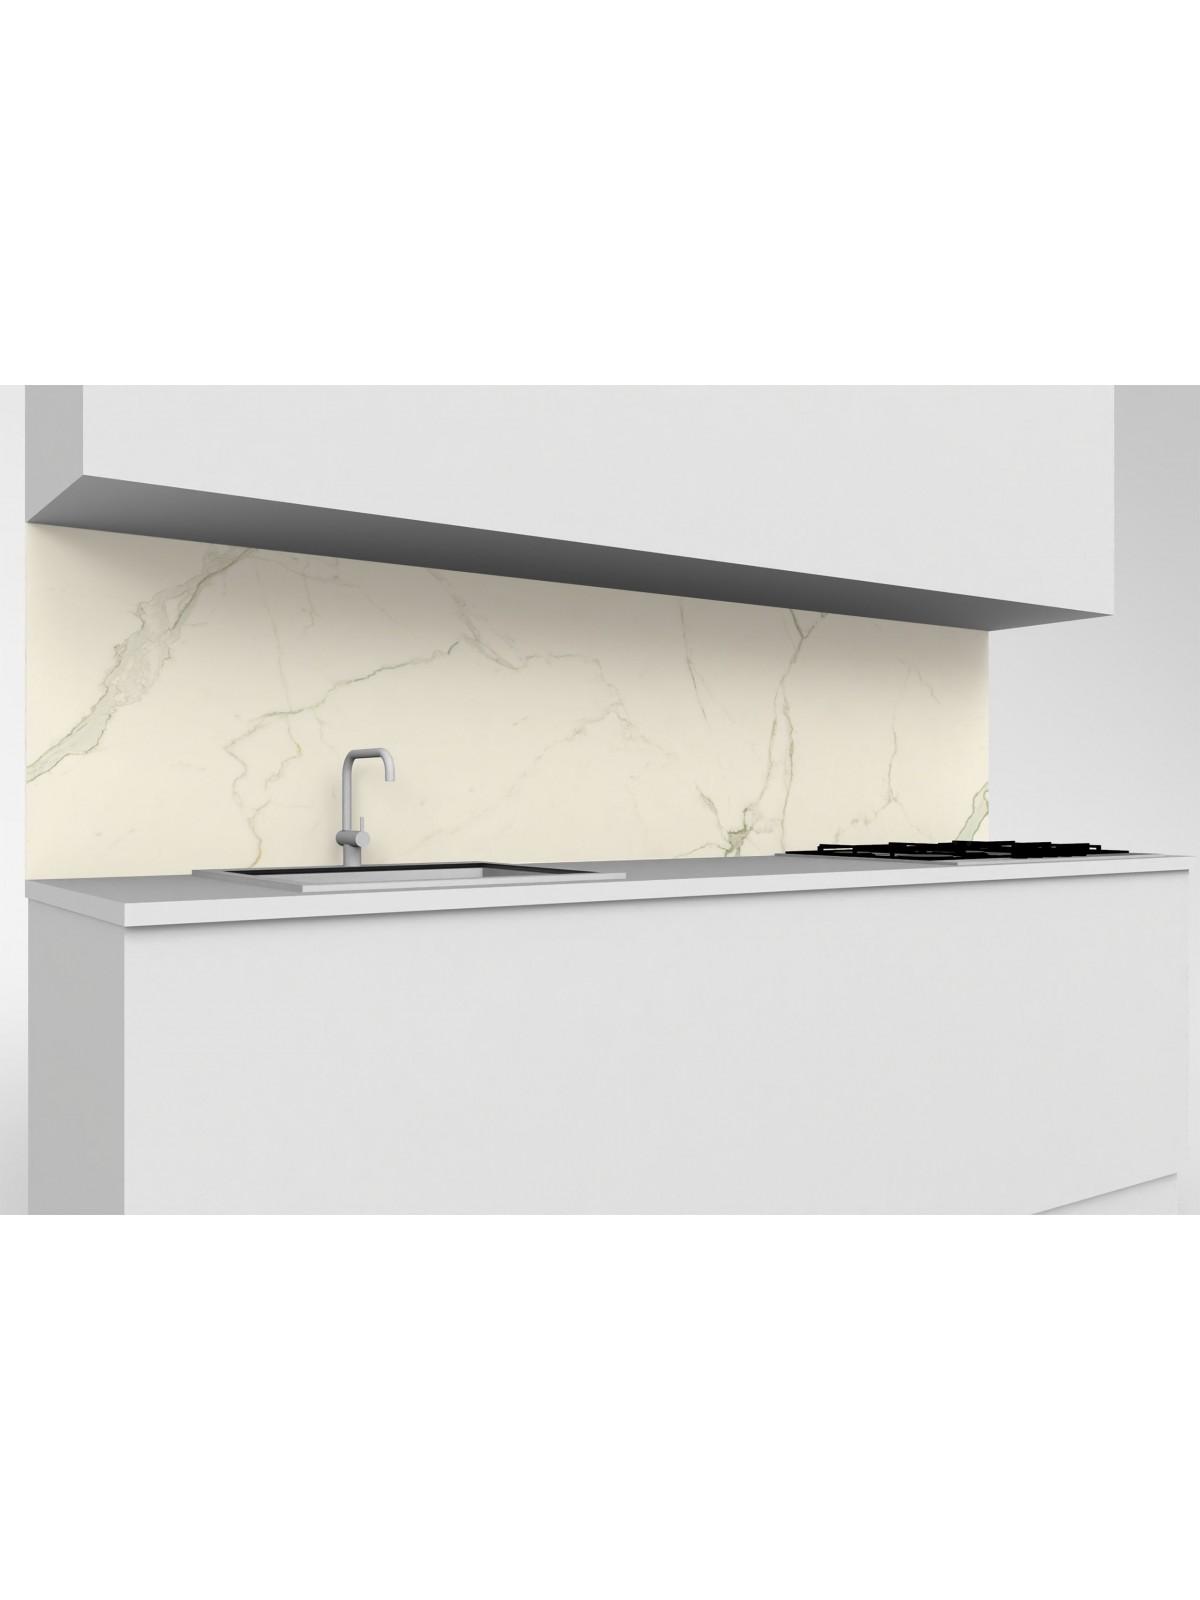 Erhöhte obere mobile Küche in Keramik Atlas Concorde Calacatta Extra